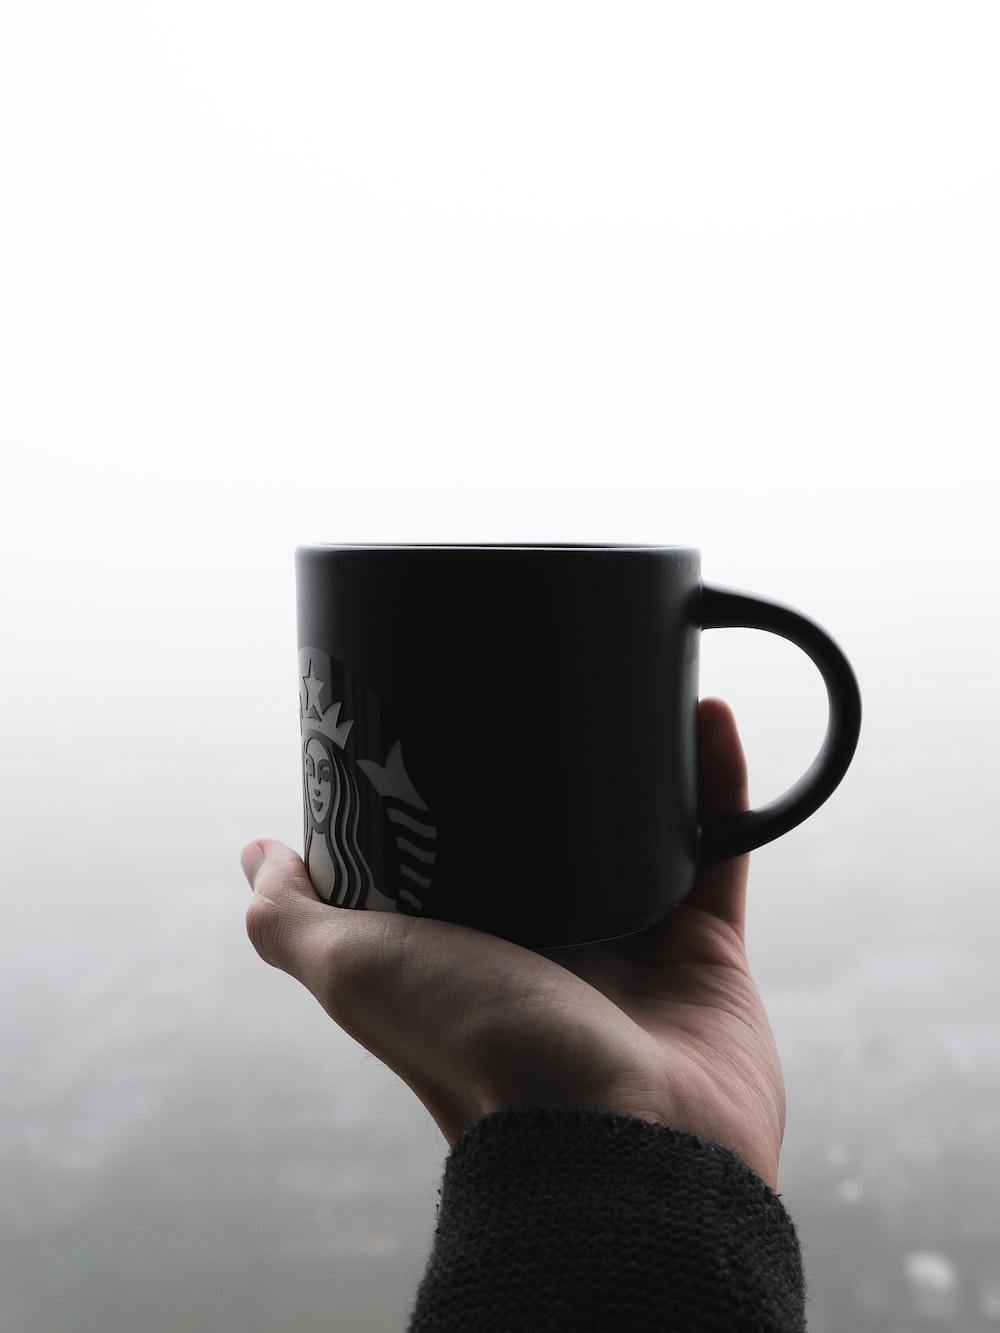 person holding black ceramic mug